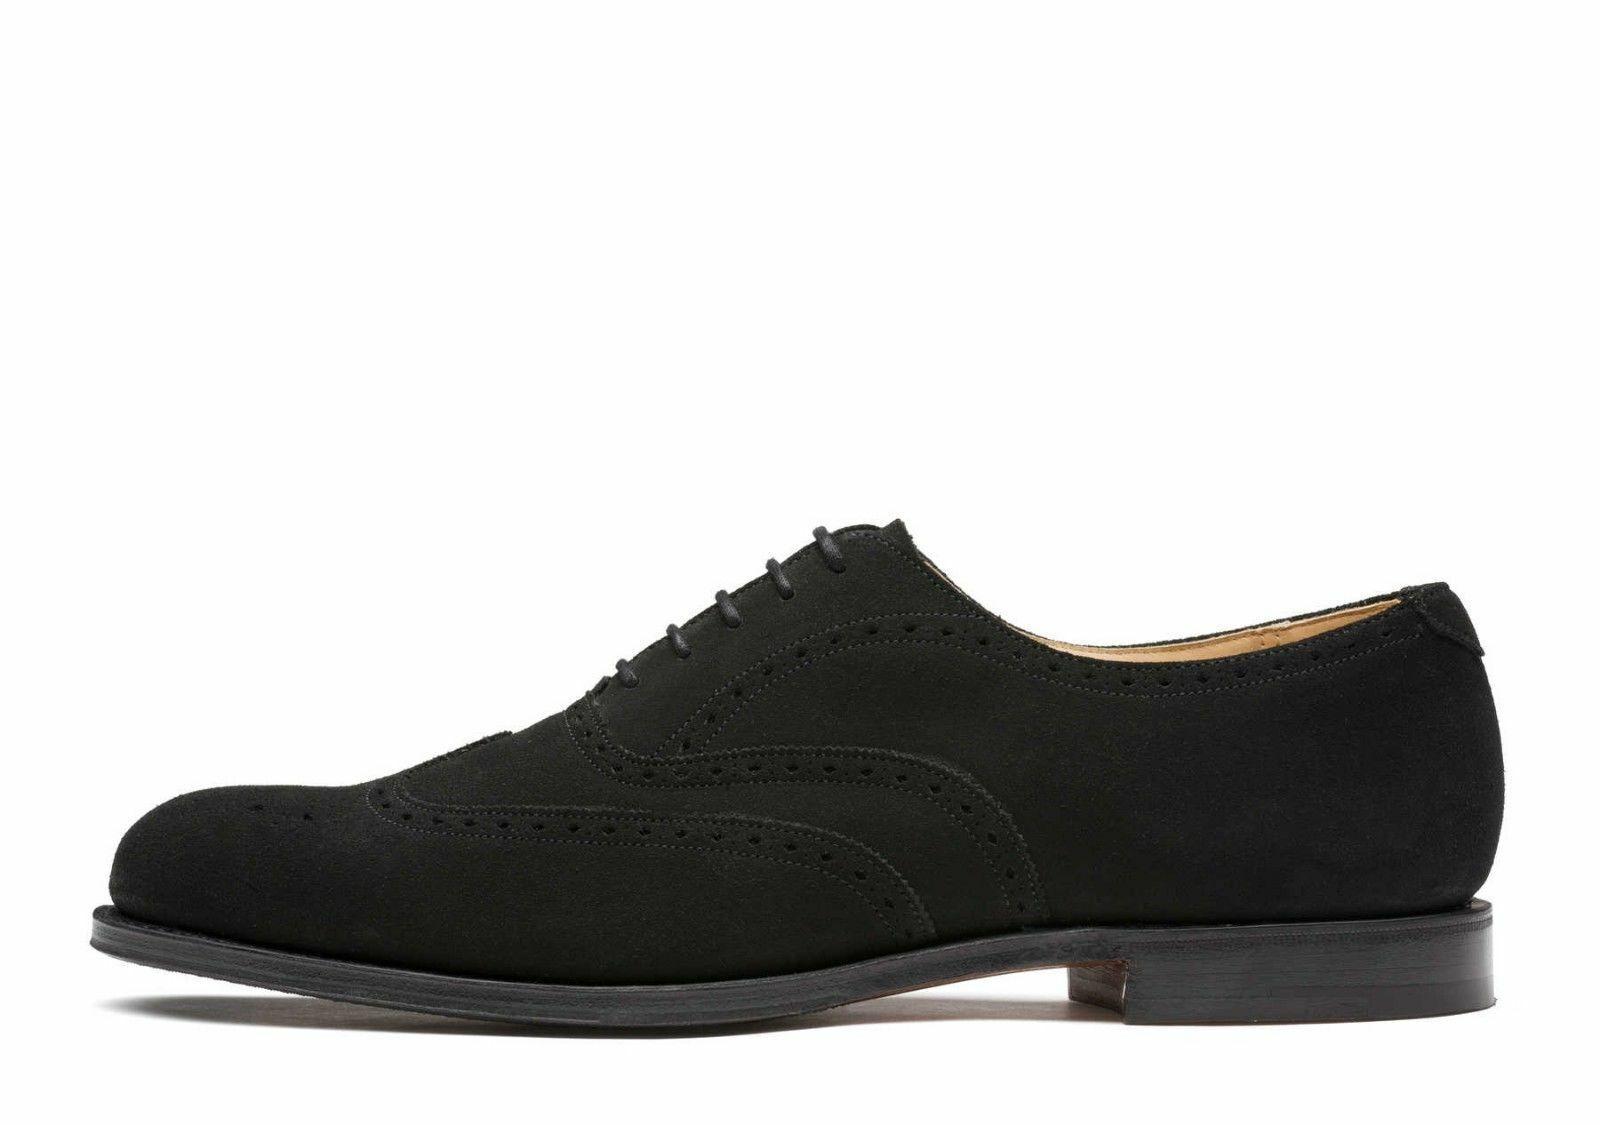 Zapatos para hombre hecho a mano Bespoke Vestido Formal De Gamuza Negra Clásica Punta del ala Bota Informal